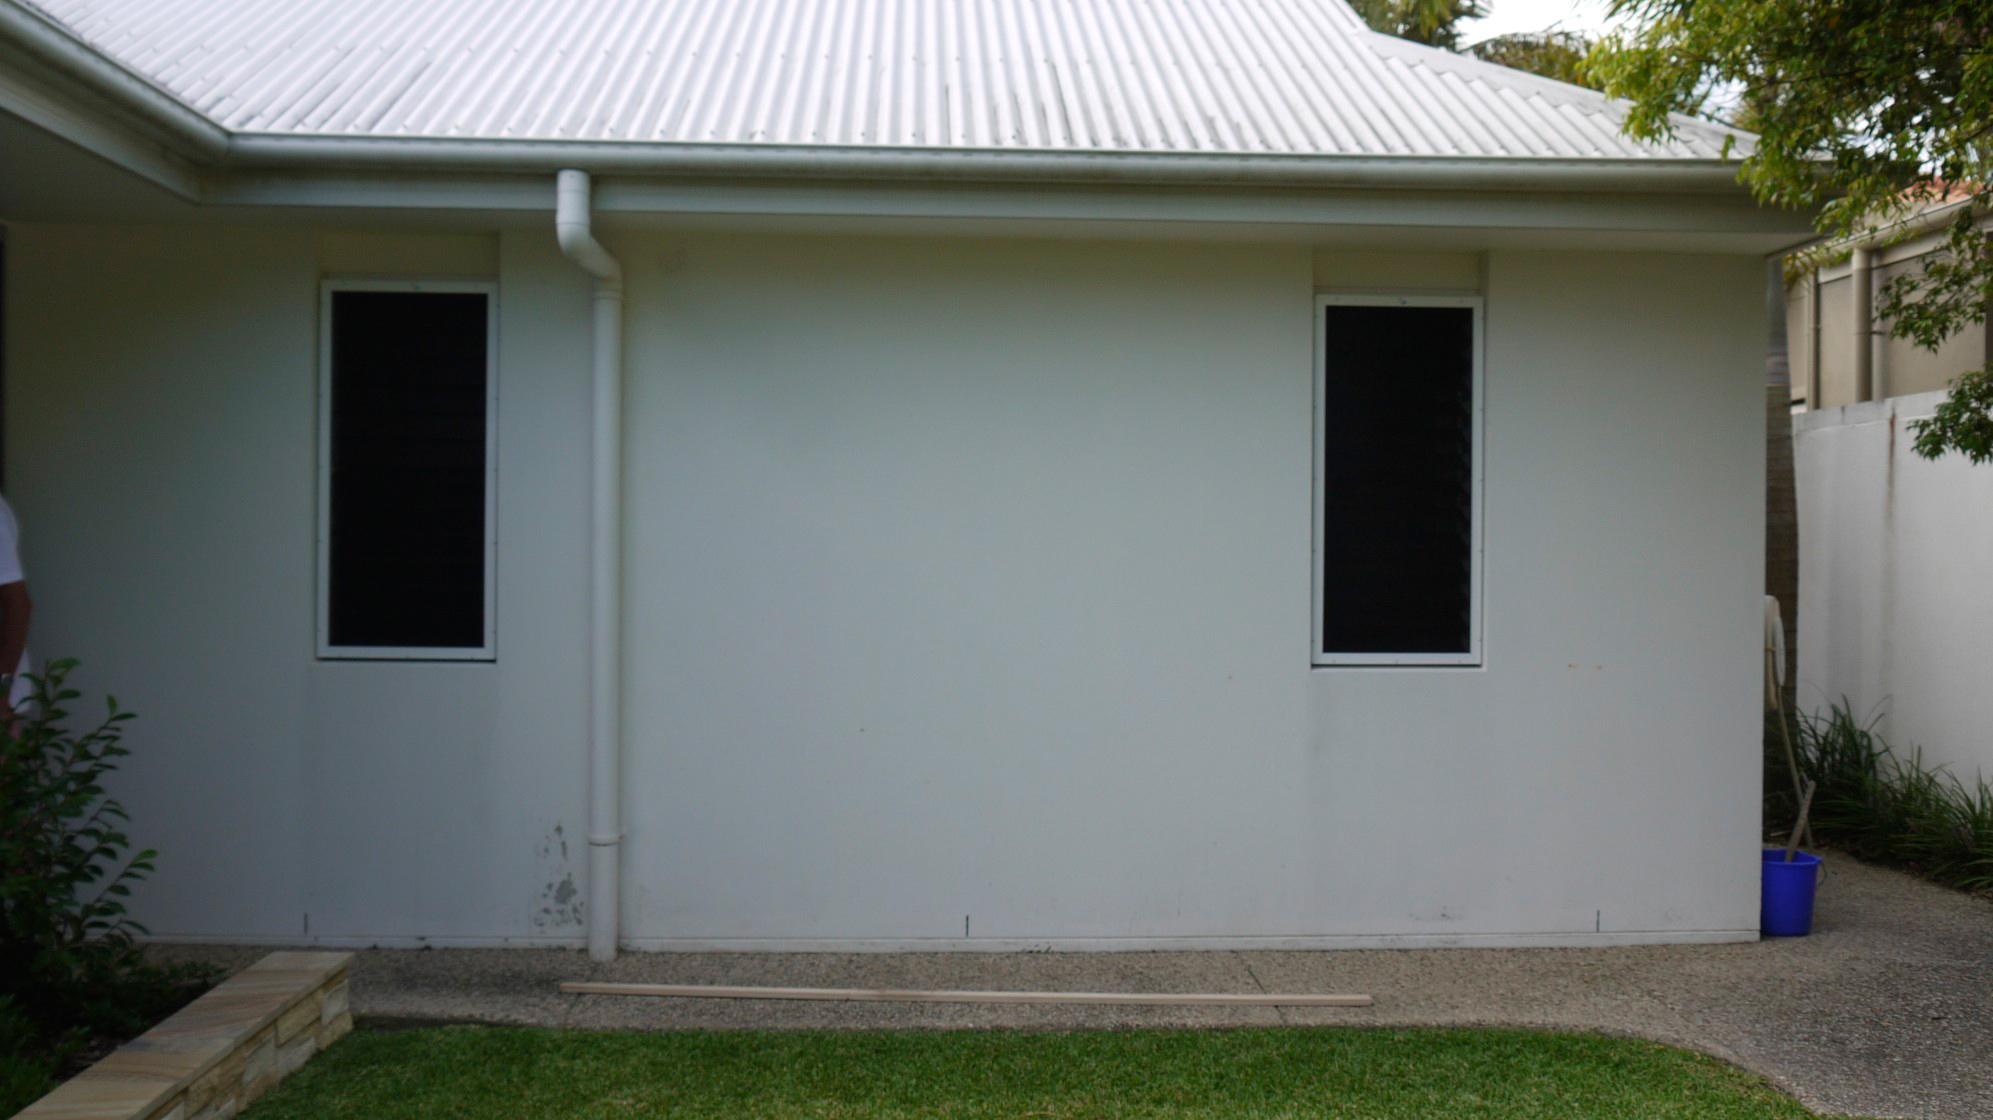 the blank wall-width 8.5m